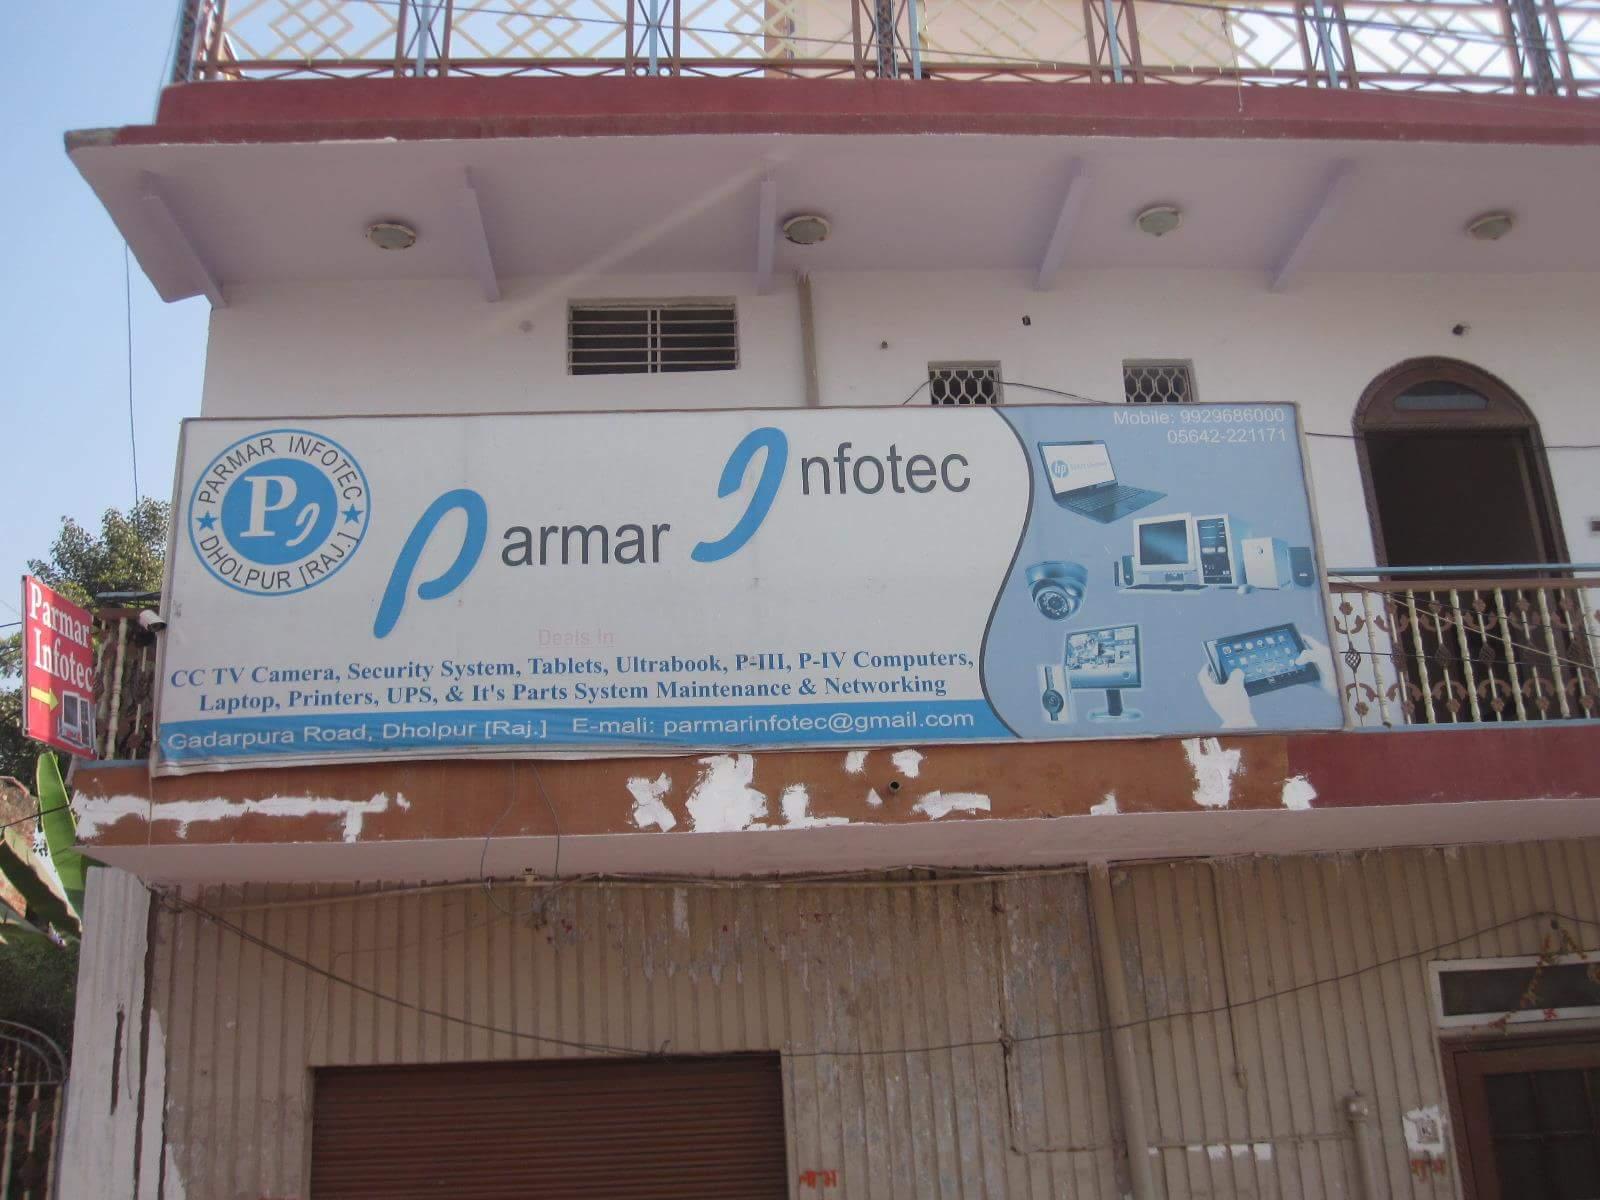 Parmar Infotec - logo